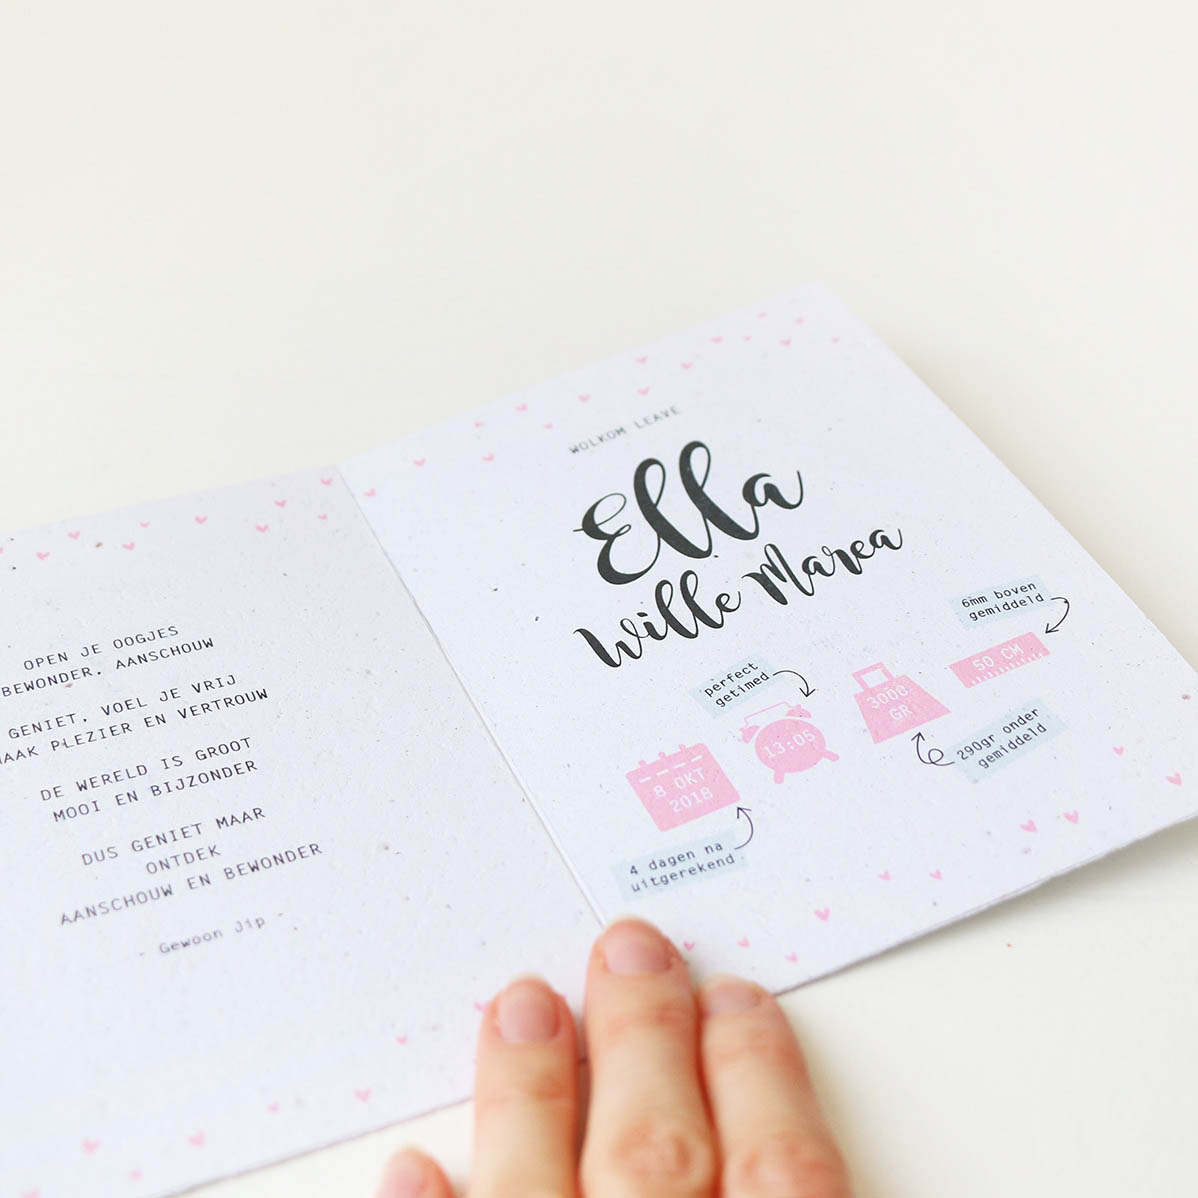 Studio Chris10 - Geboortekaartje ontwerp Ella